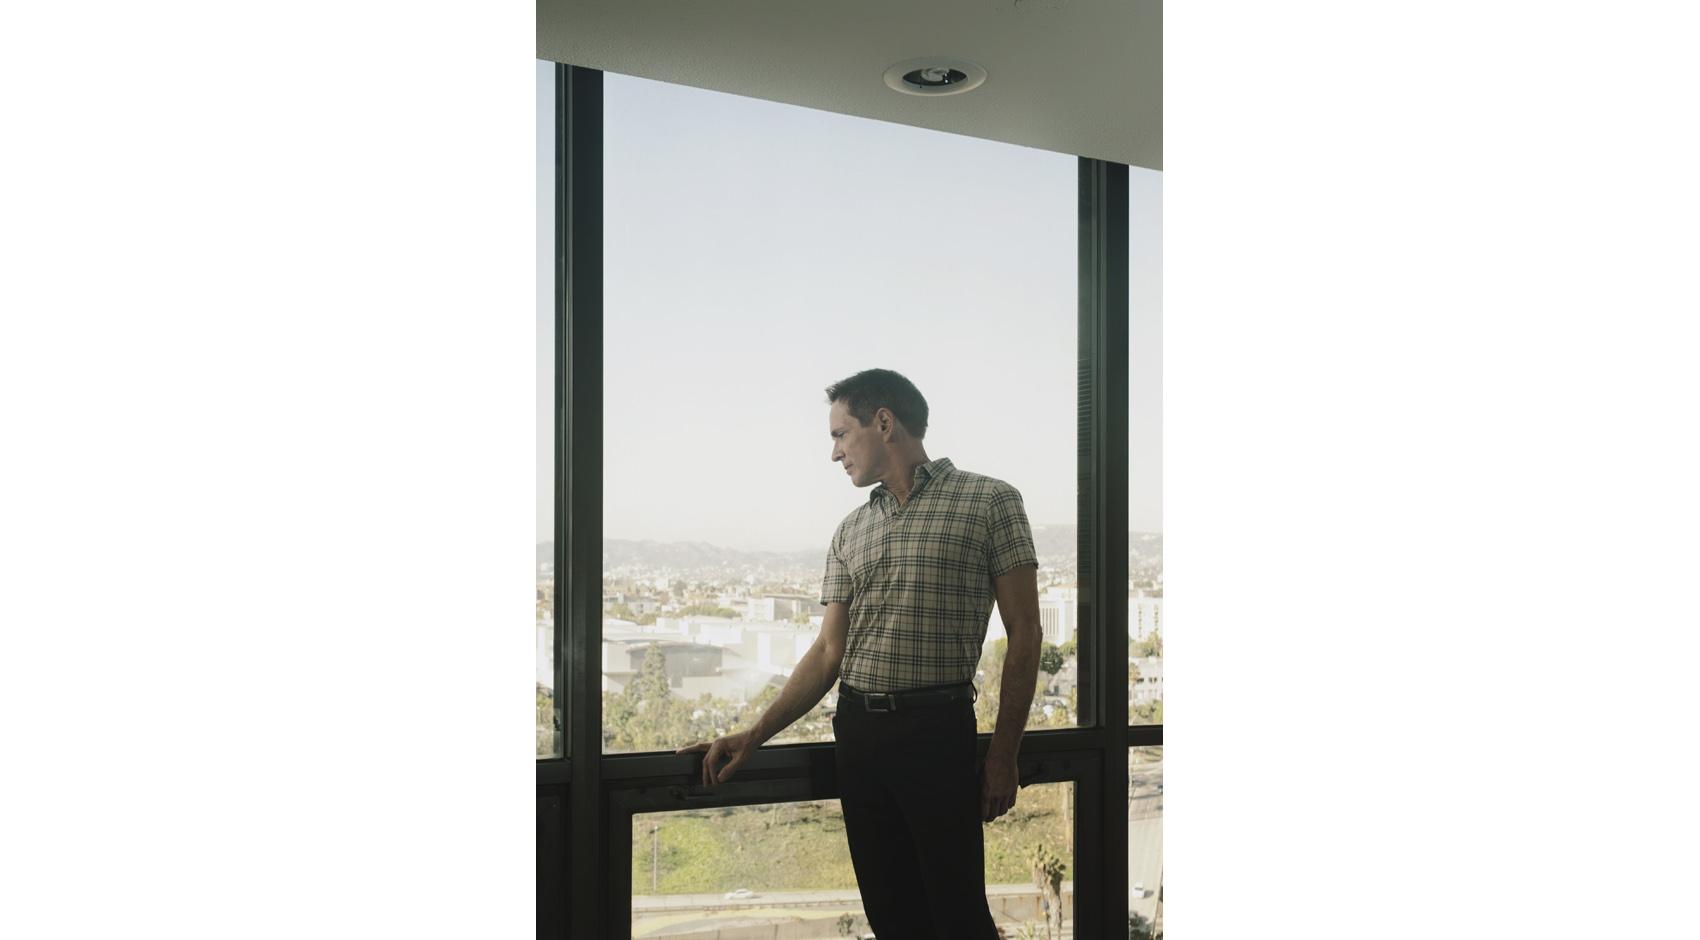 Men Over 50 - Tim